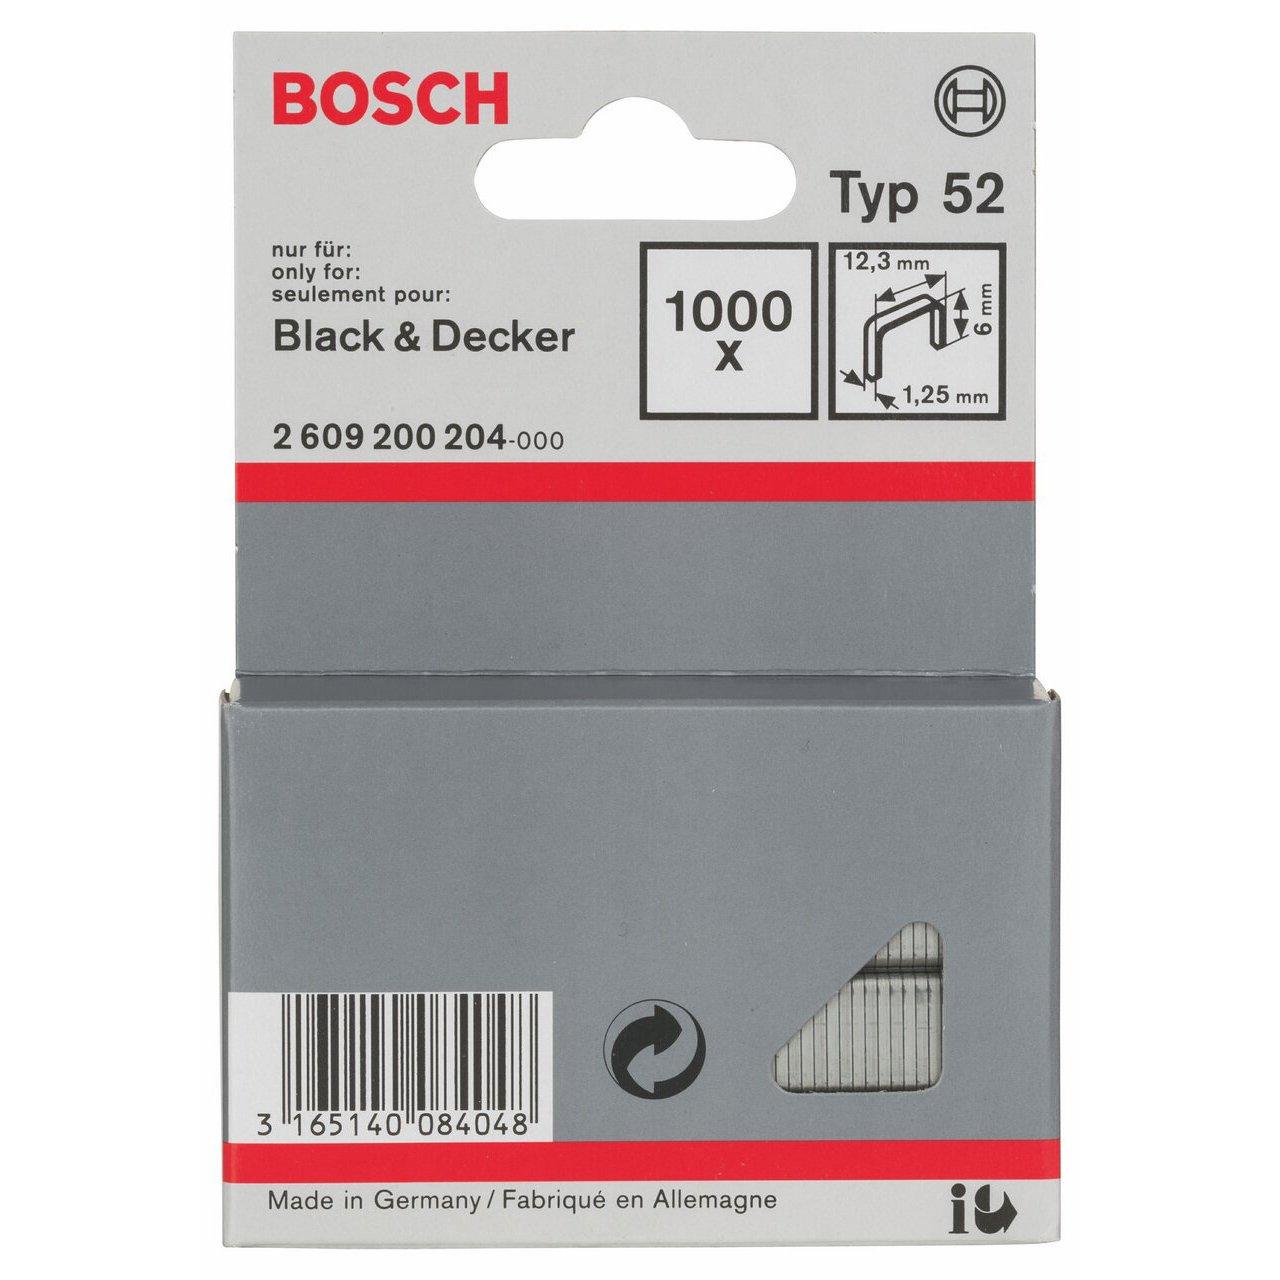 Bosch Professional 2609200205 1000 Tackerkla mmern 8//12,3  mm Typ52